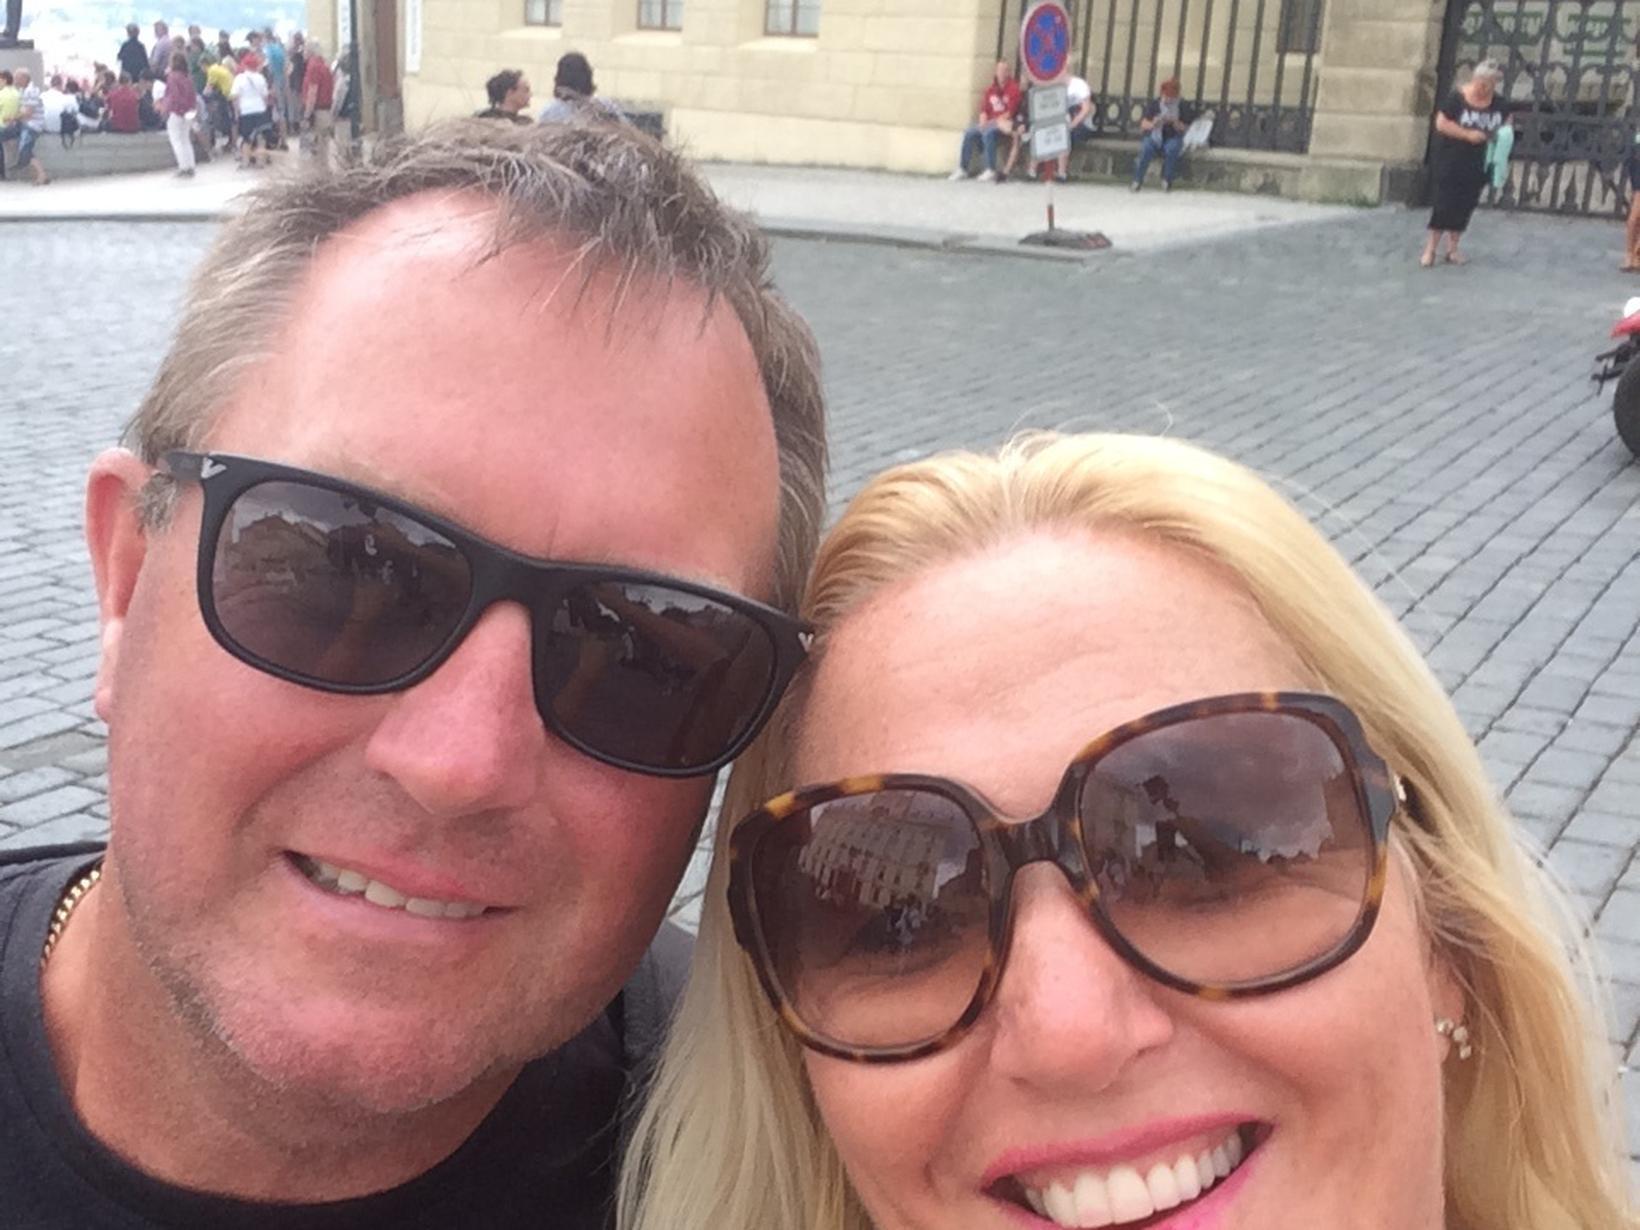 Meridee & Jeremy from Croydon, Victoria, Australia